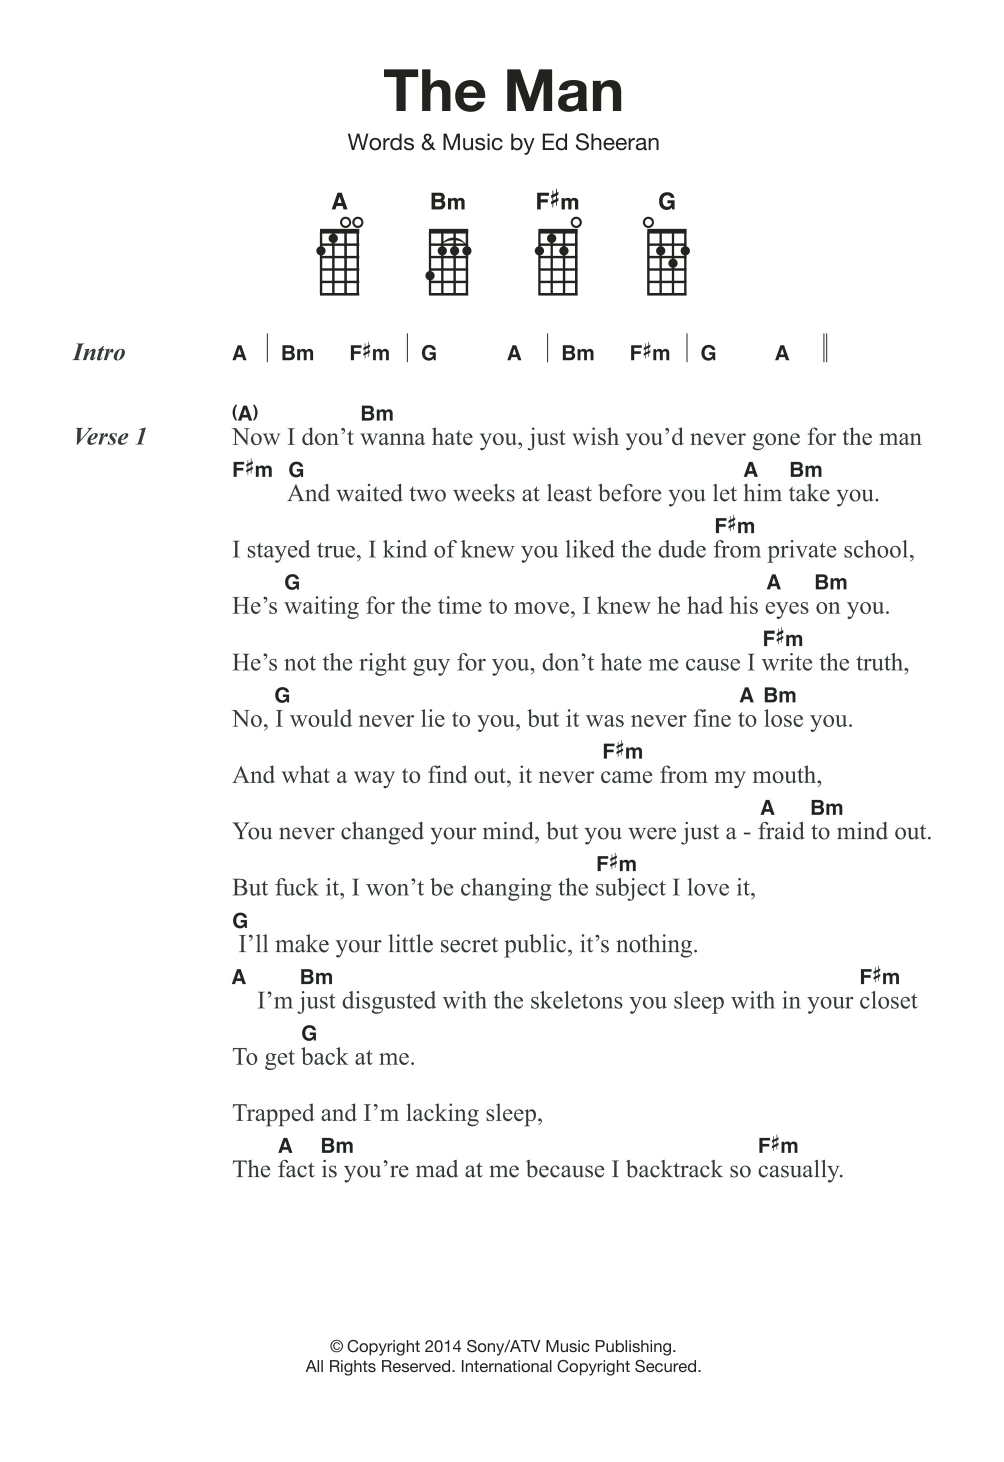 The Man Sheet Music